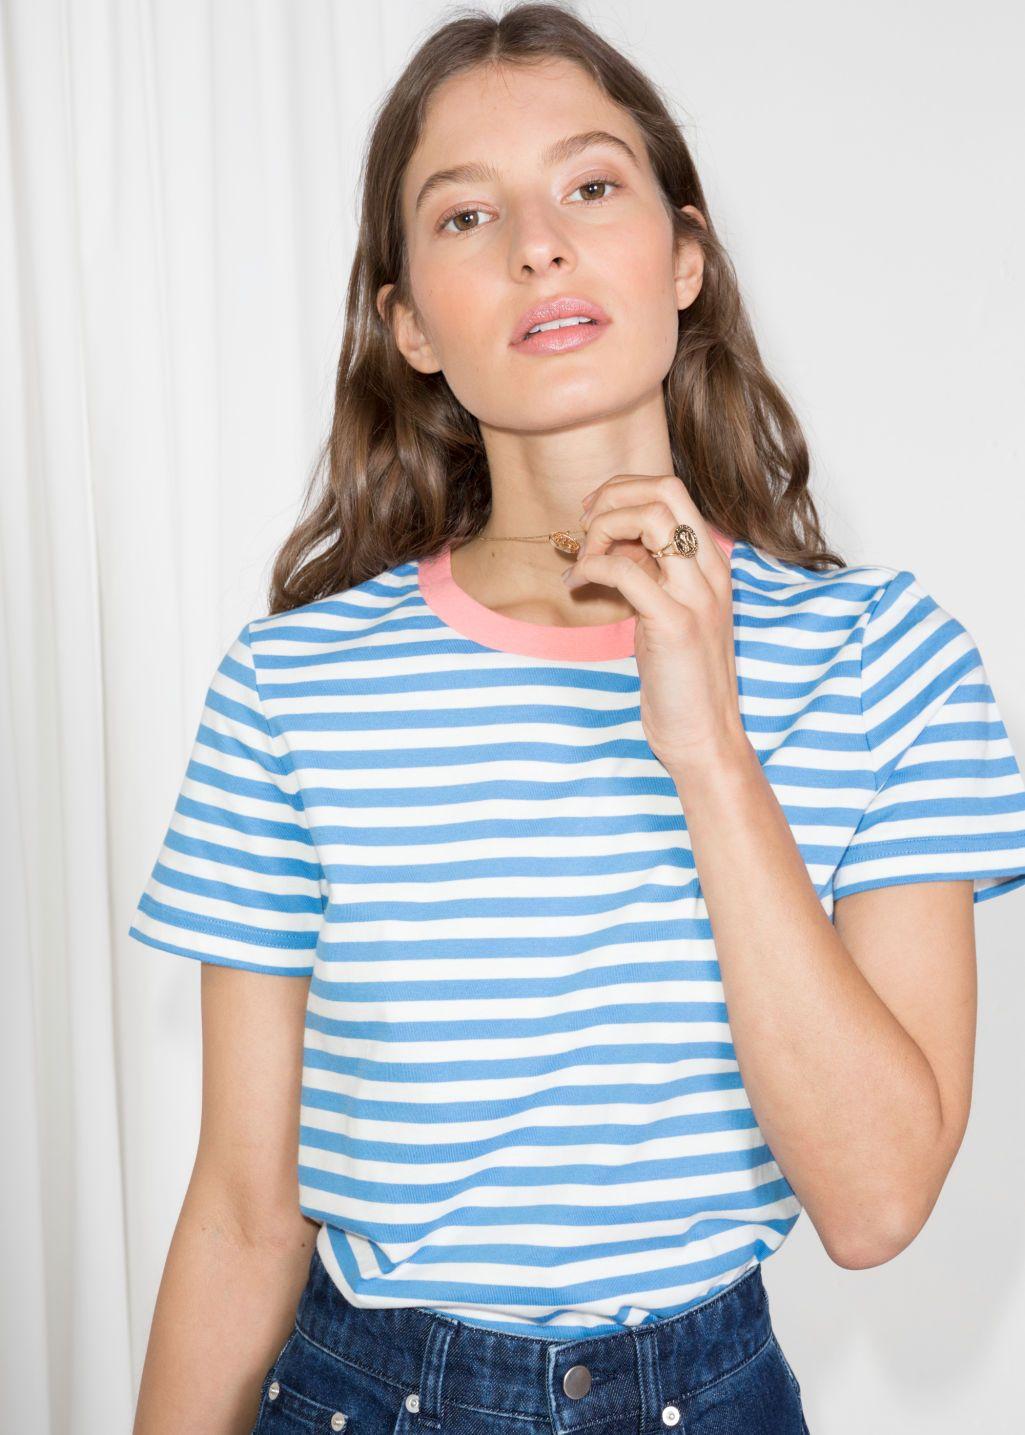 7cbd4dfc707bdb Striped Tee in 2019 | Stripes! | Striped tee, Stripes fashion, Tees